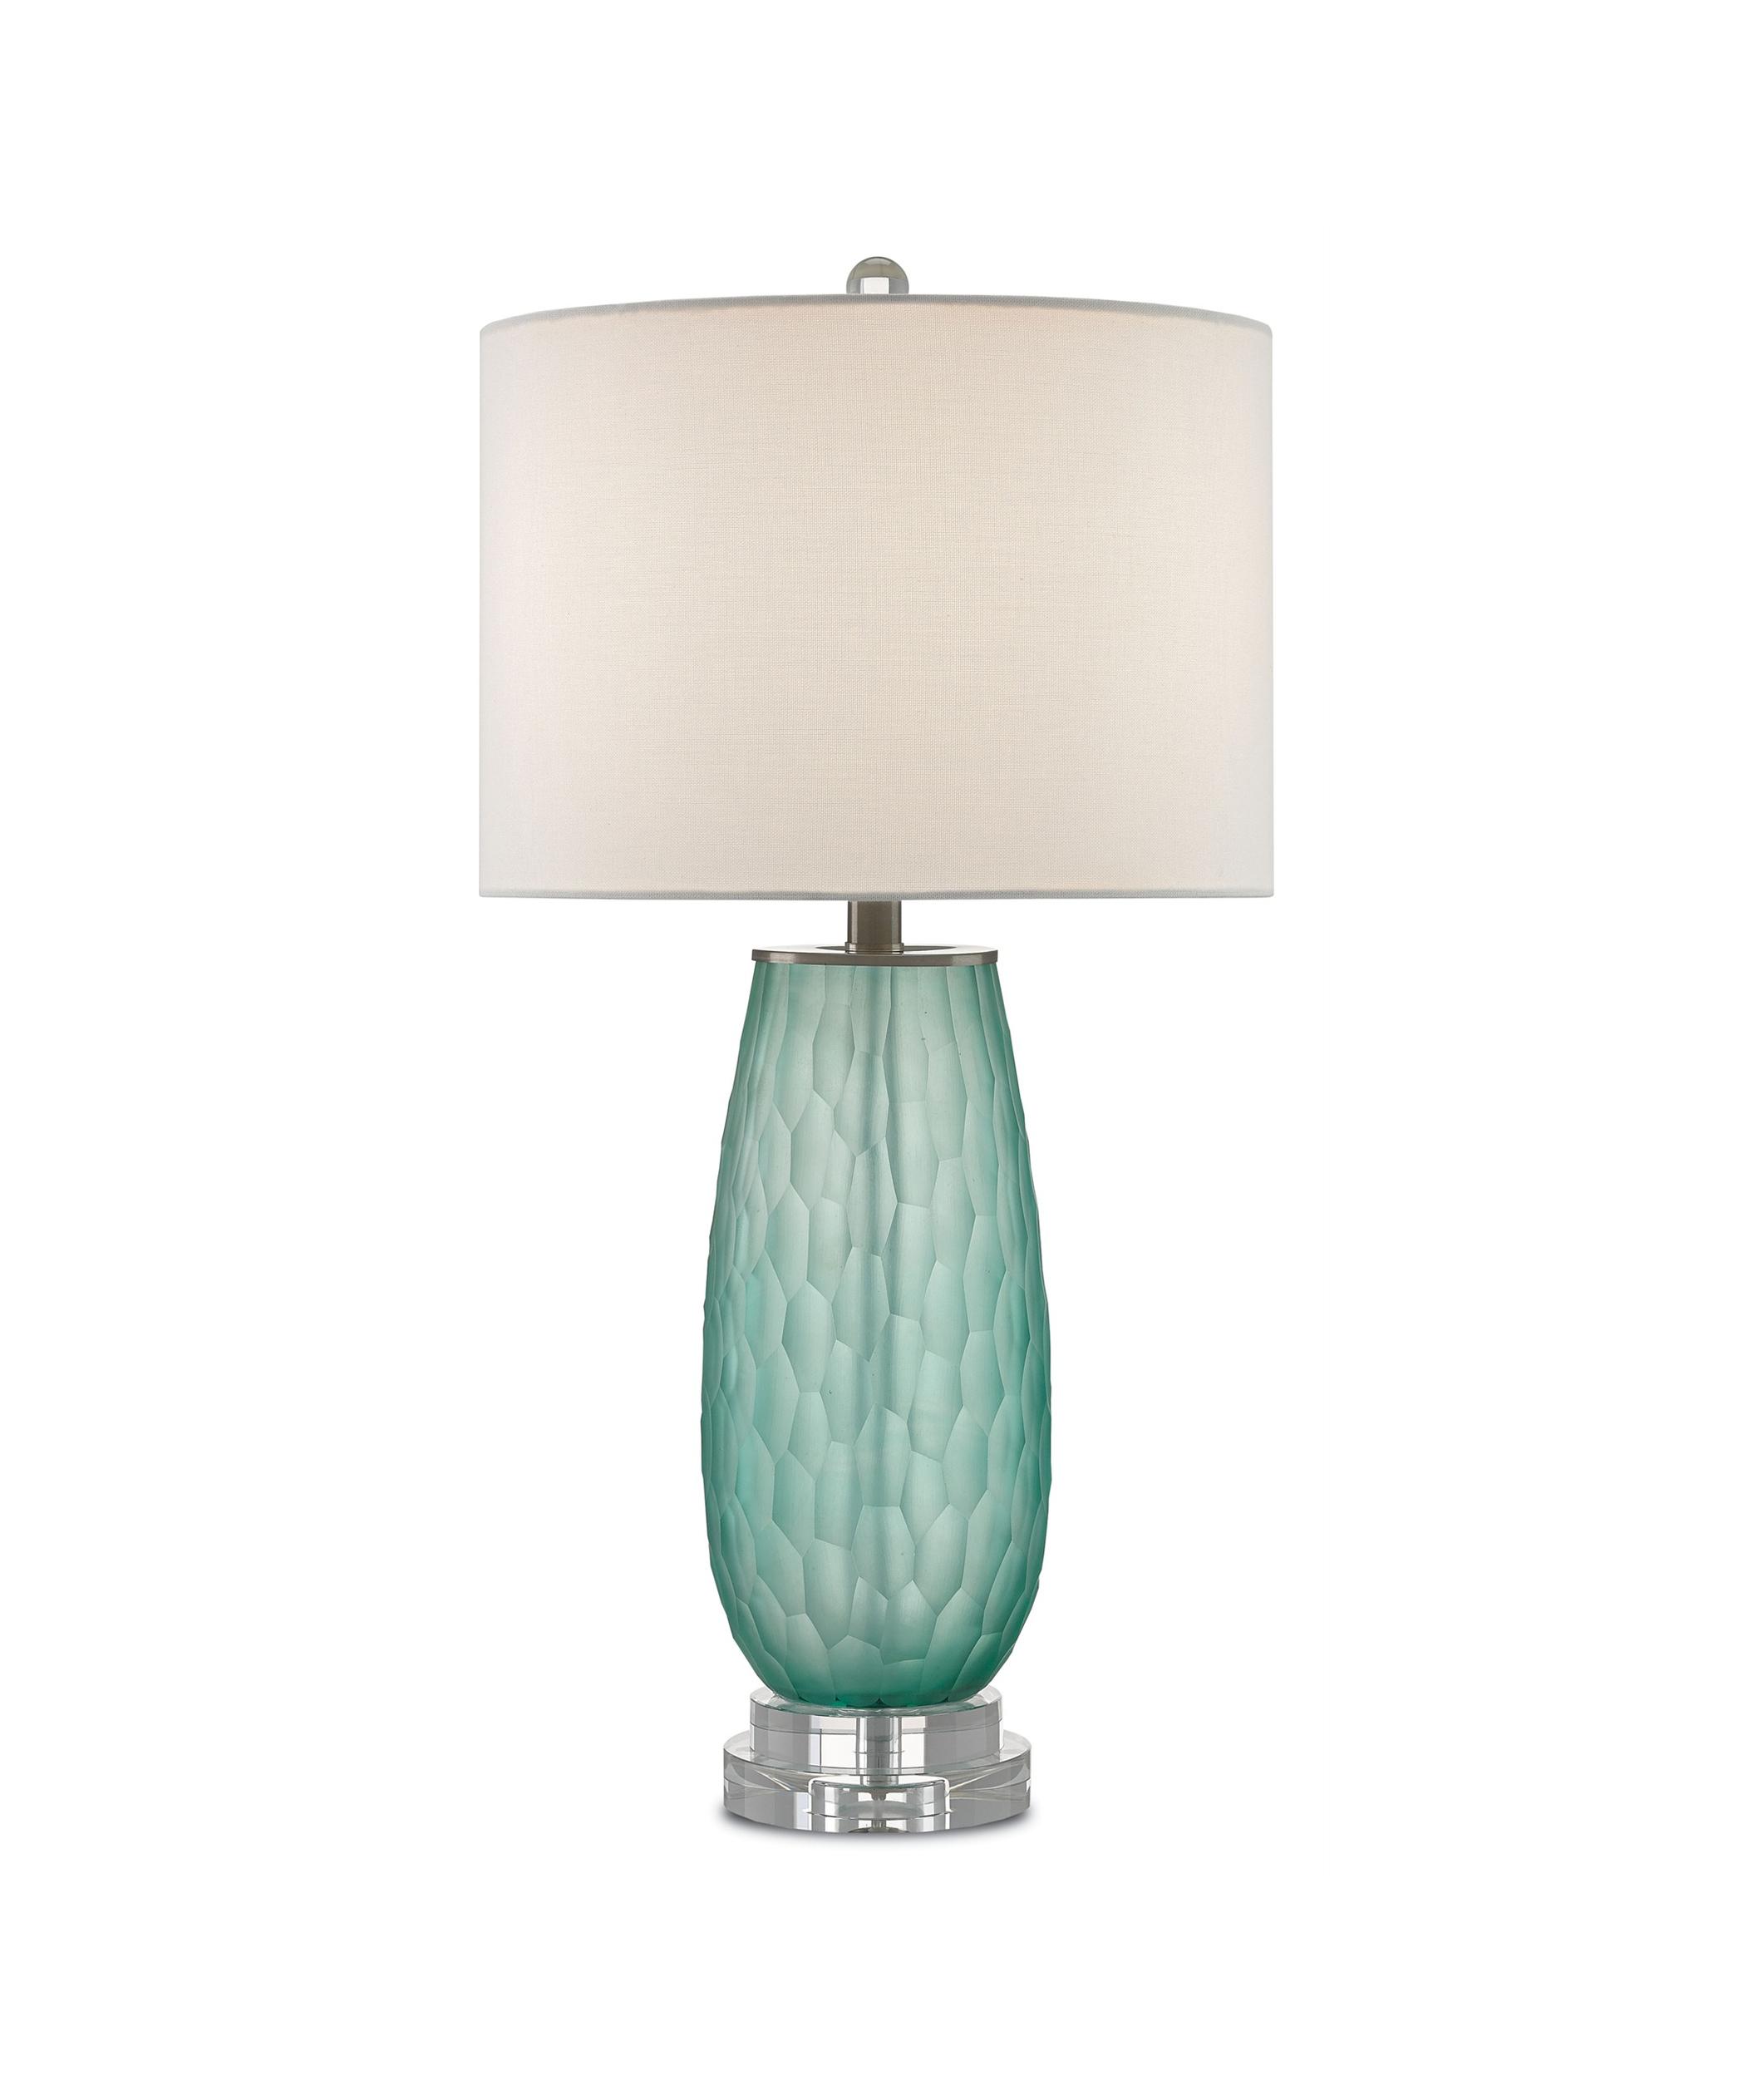 Aali Table Lamp